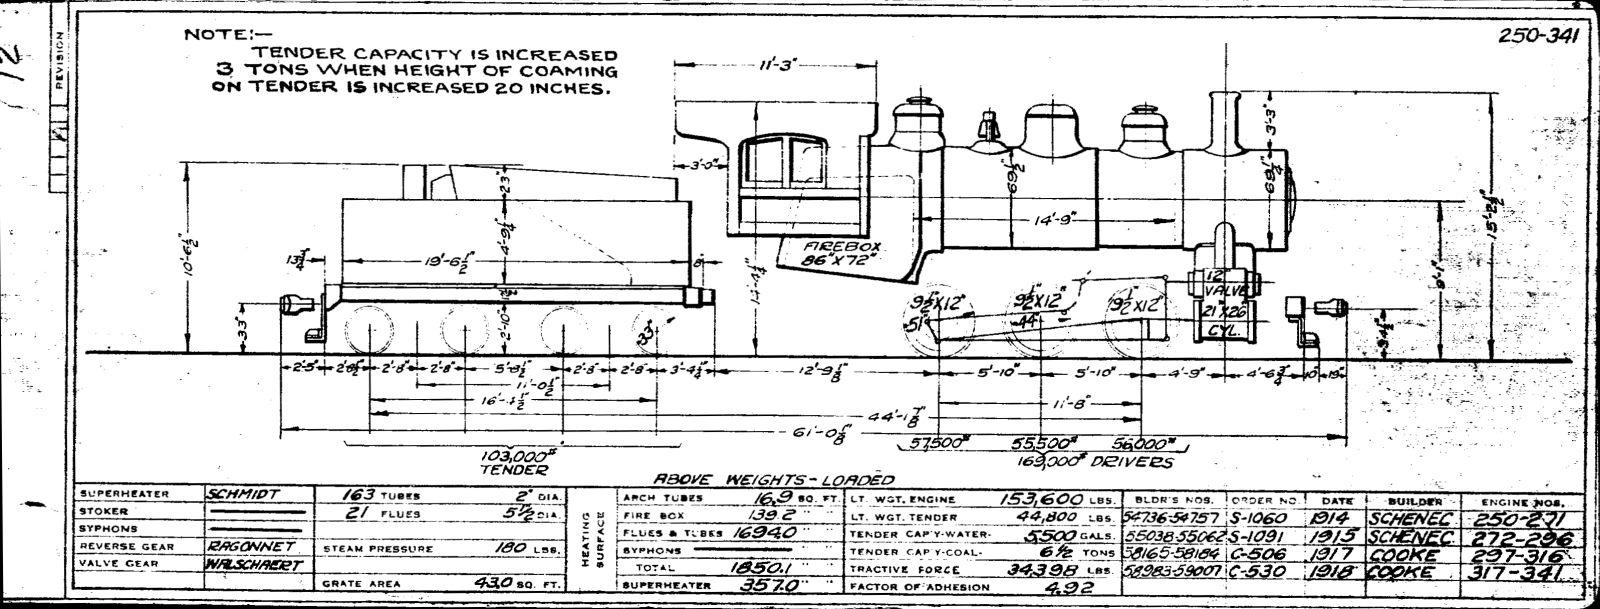 Page 18 - Locomotives 541-598. Page 19 - Locomotives 641-644. Page 20 -  Locomotives 651-670, 671-730